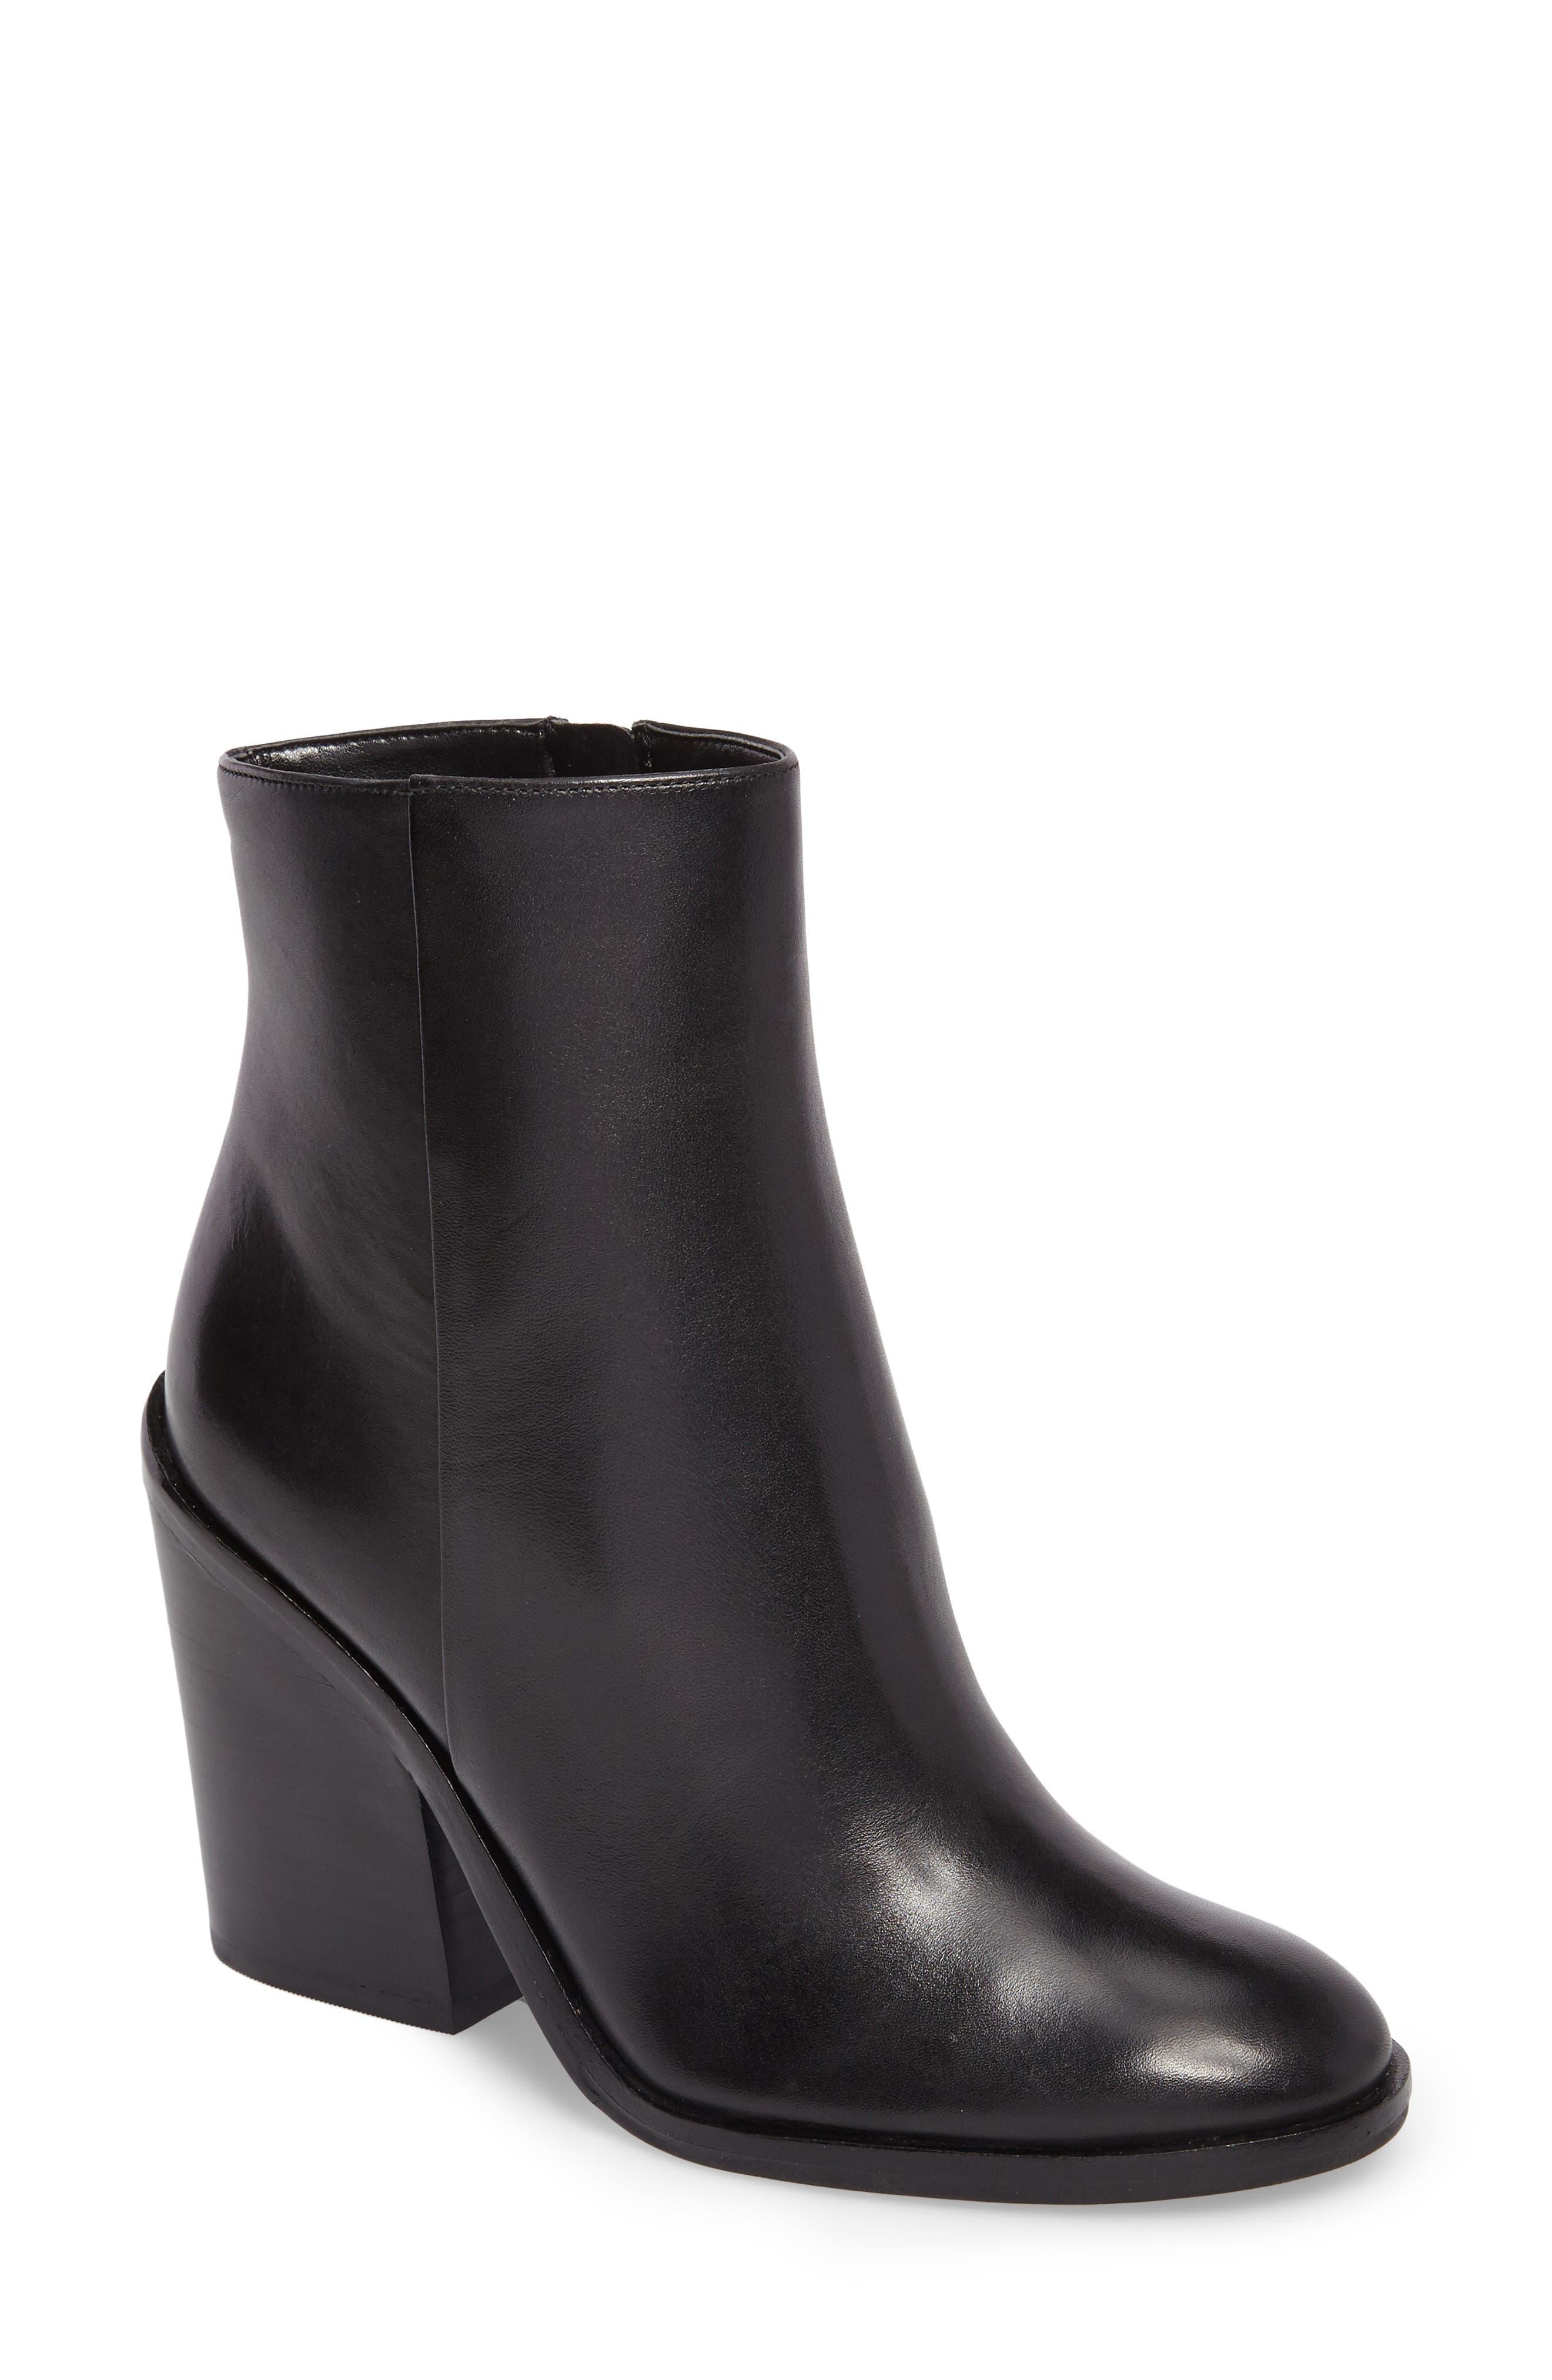 Mena Bootie,                         Main,                         color, Black Leather